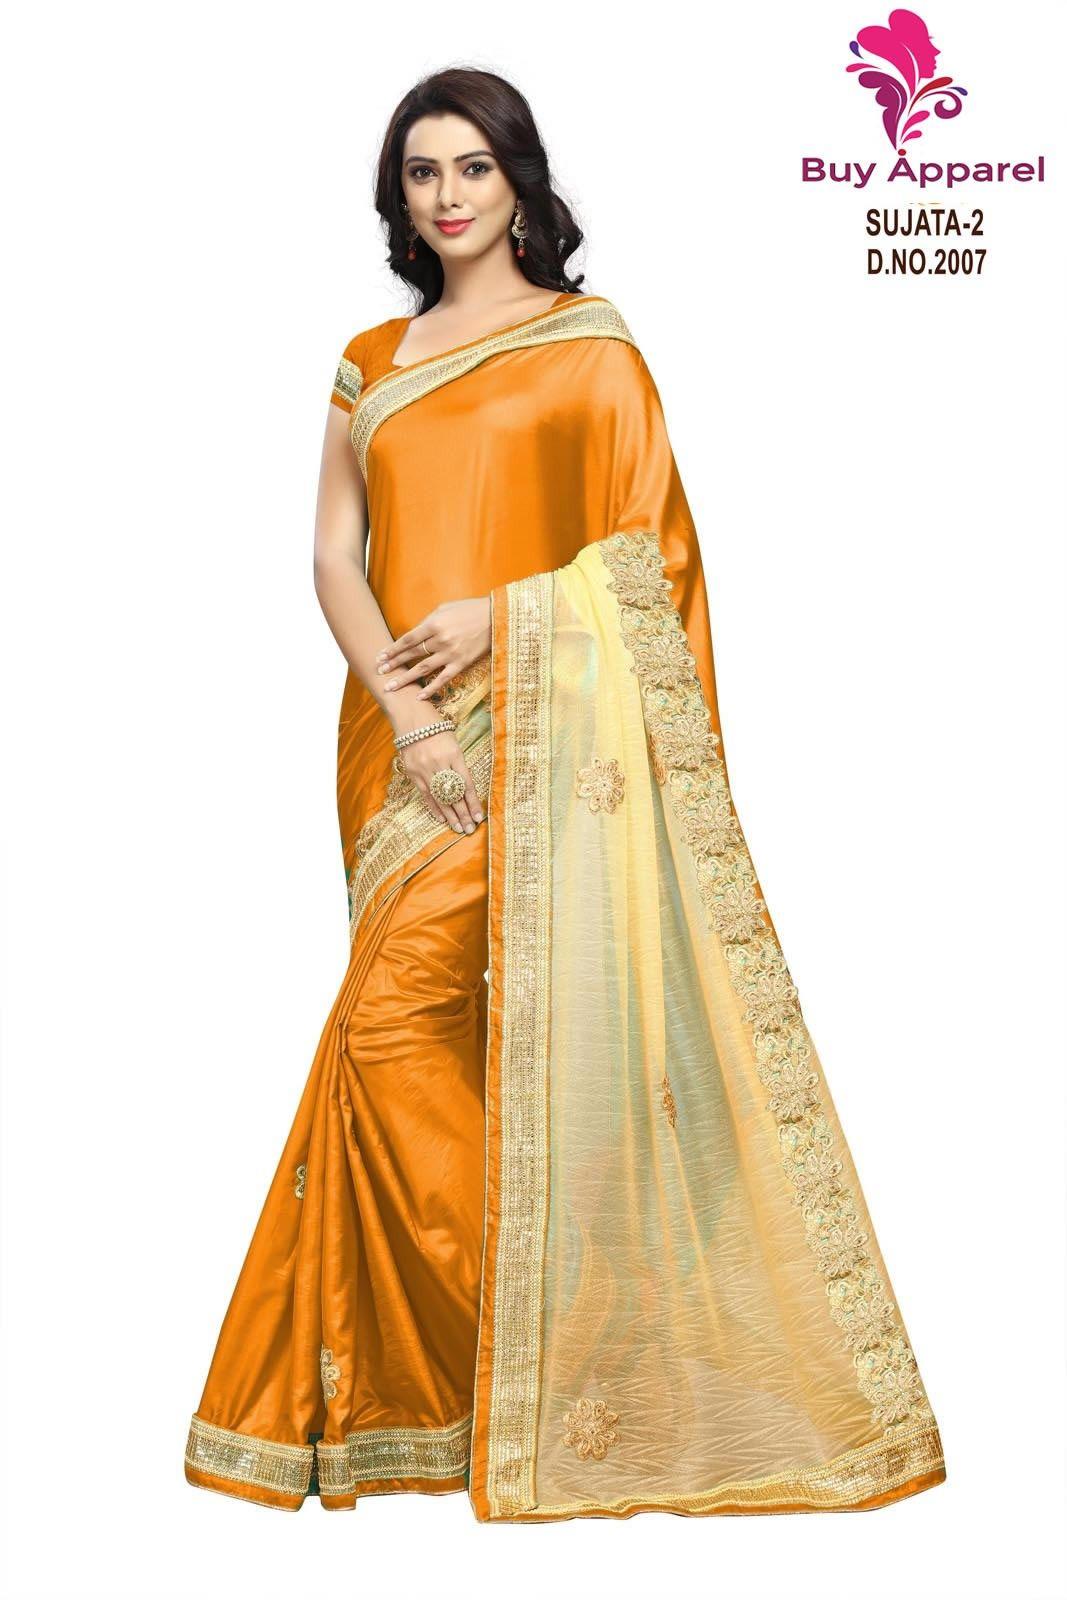 da2f22f7b367a buy saree online Orange Colour Designer Embroidered Paper Silk Saree Buy  Saree online UK - Buy Sarees online